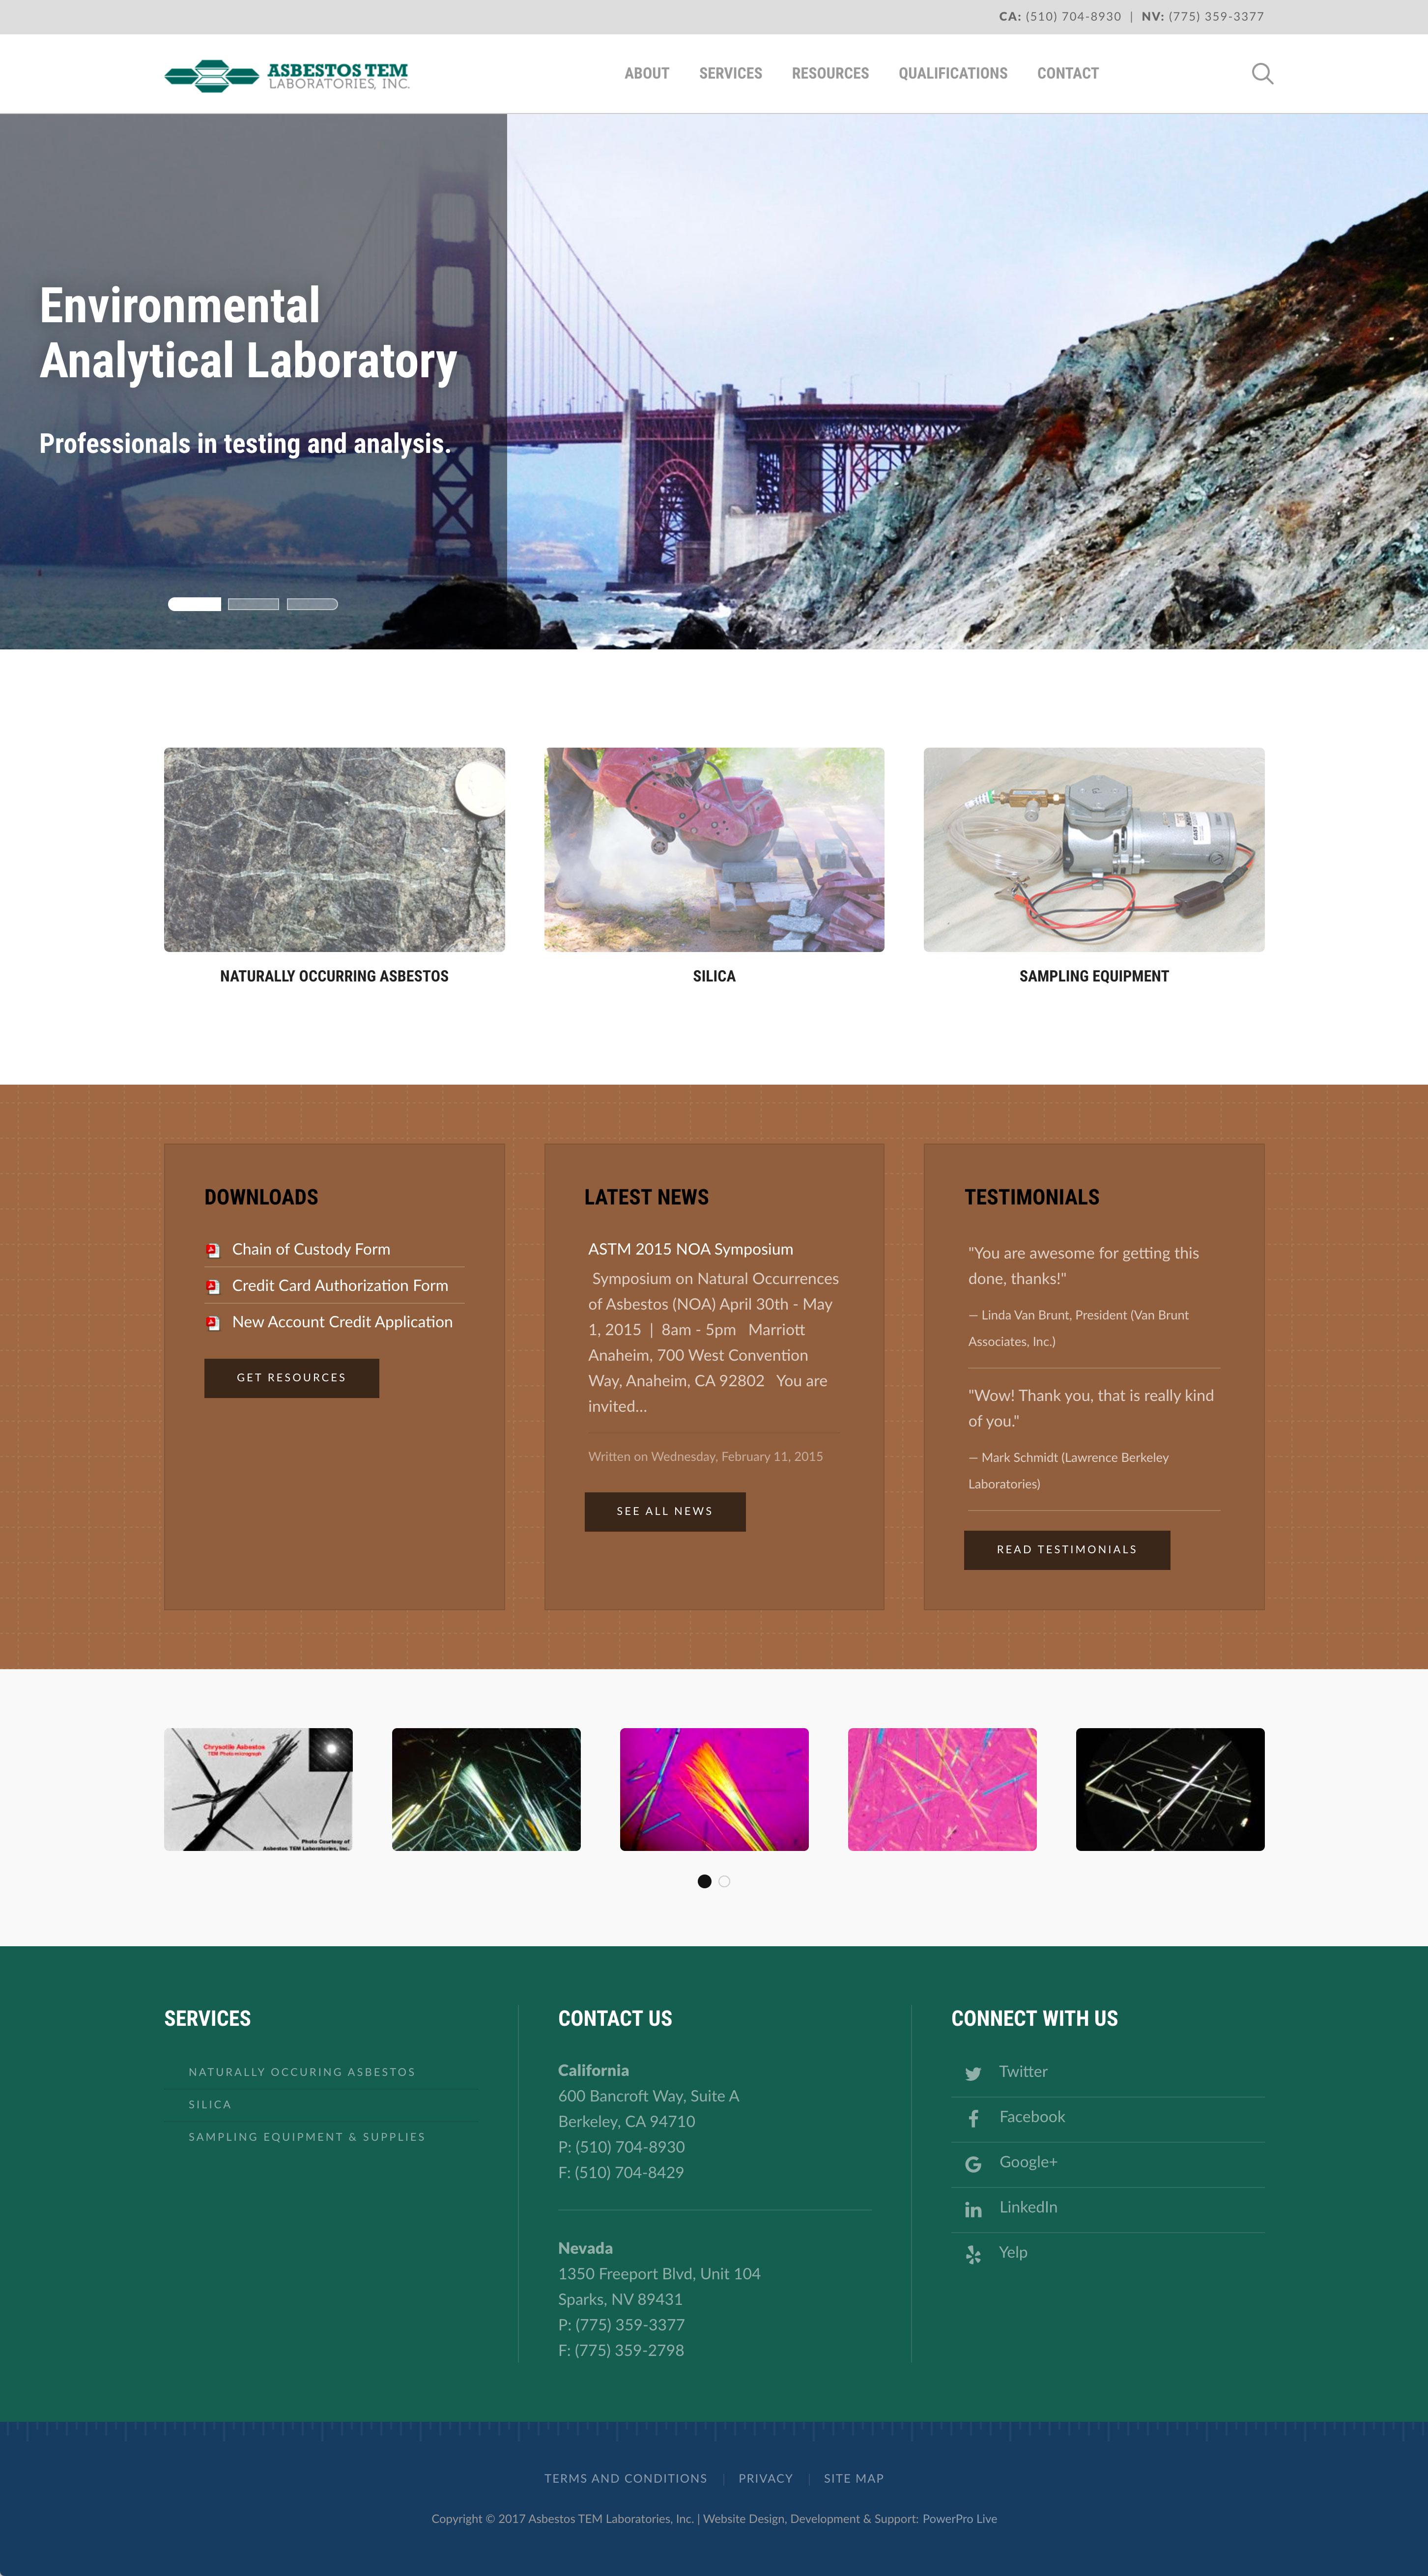 asbestos-tem-lab-website